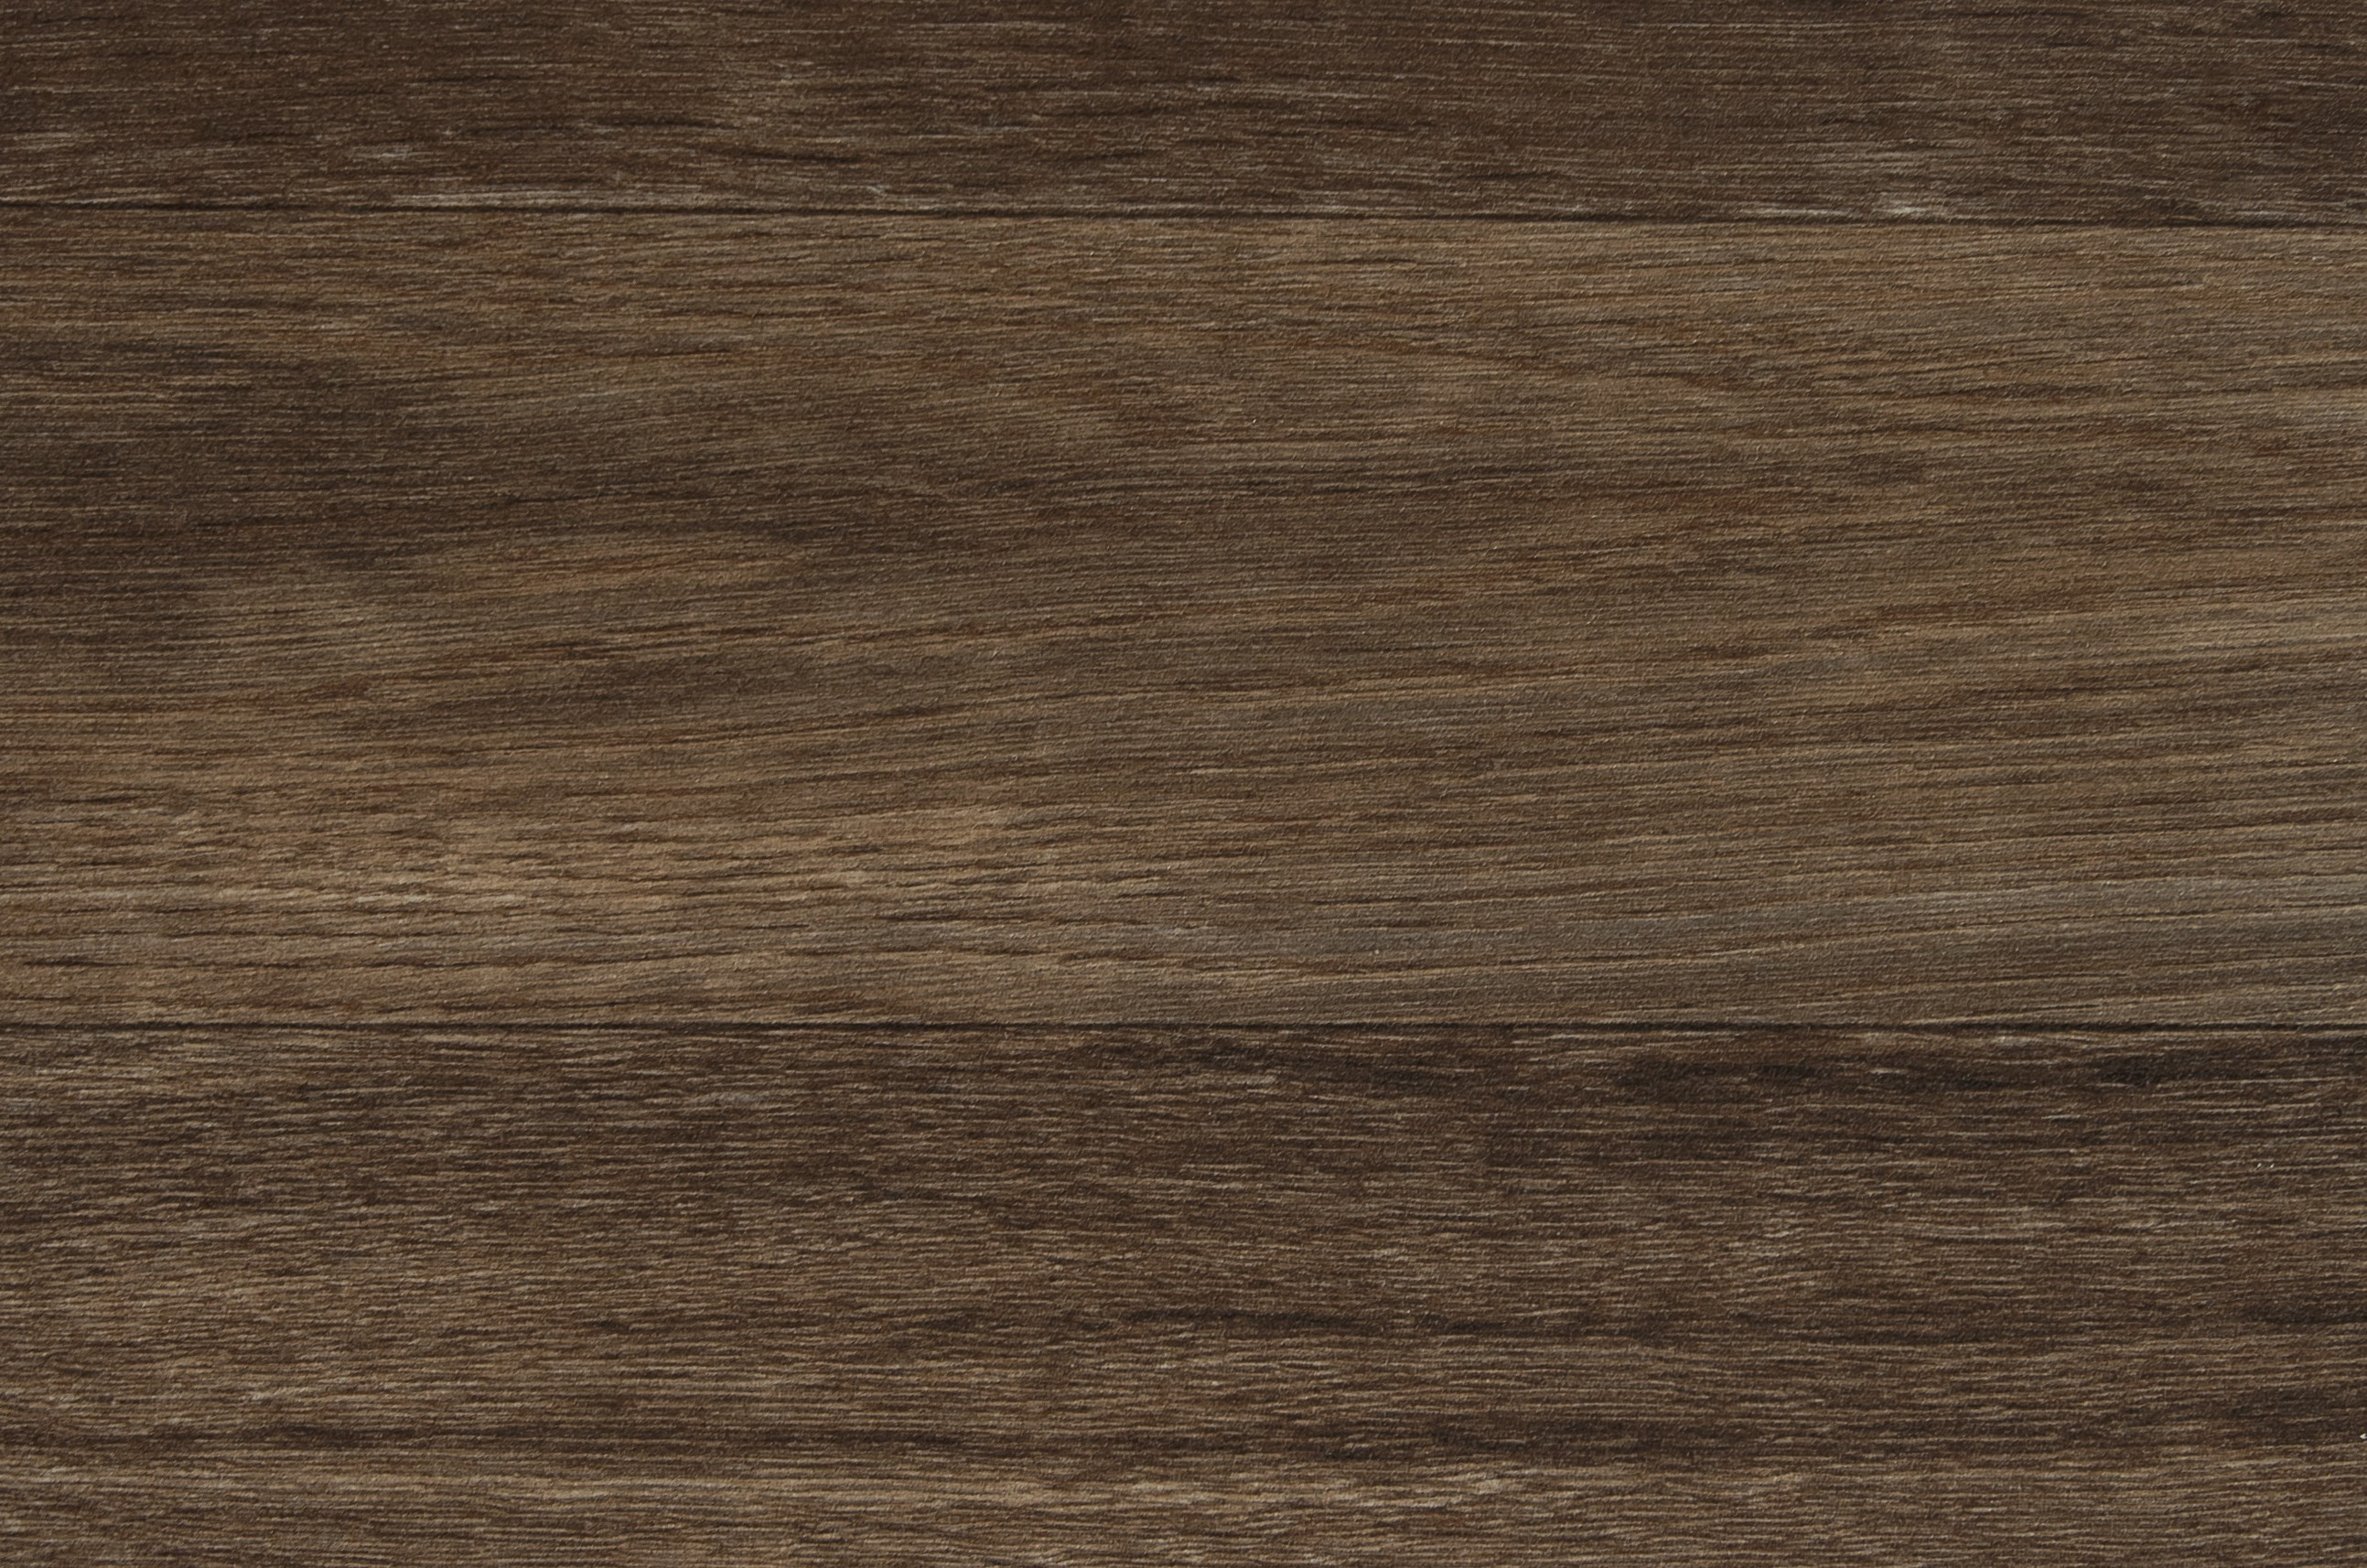 PVC podlaha Xtreme Natural Oak 369M - Rozměr na míru cm